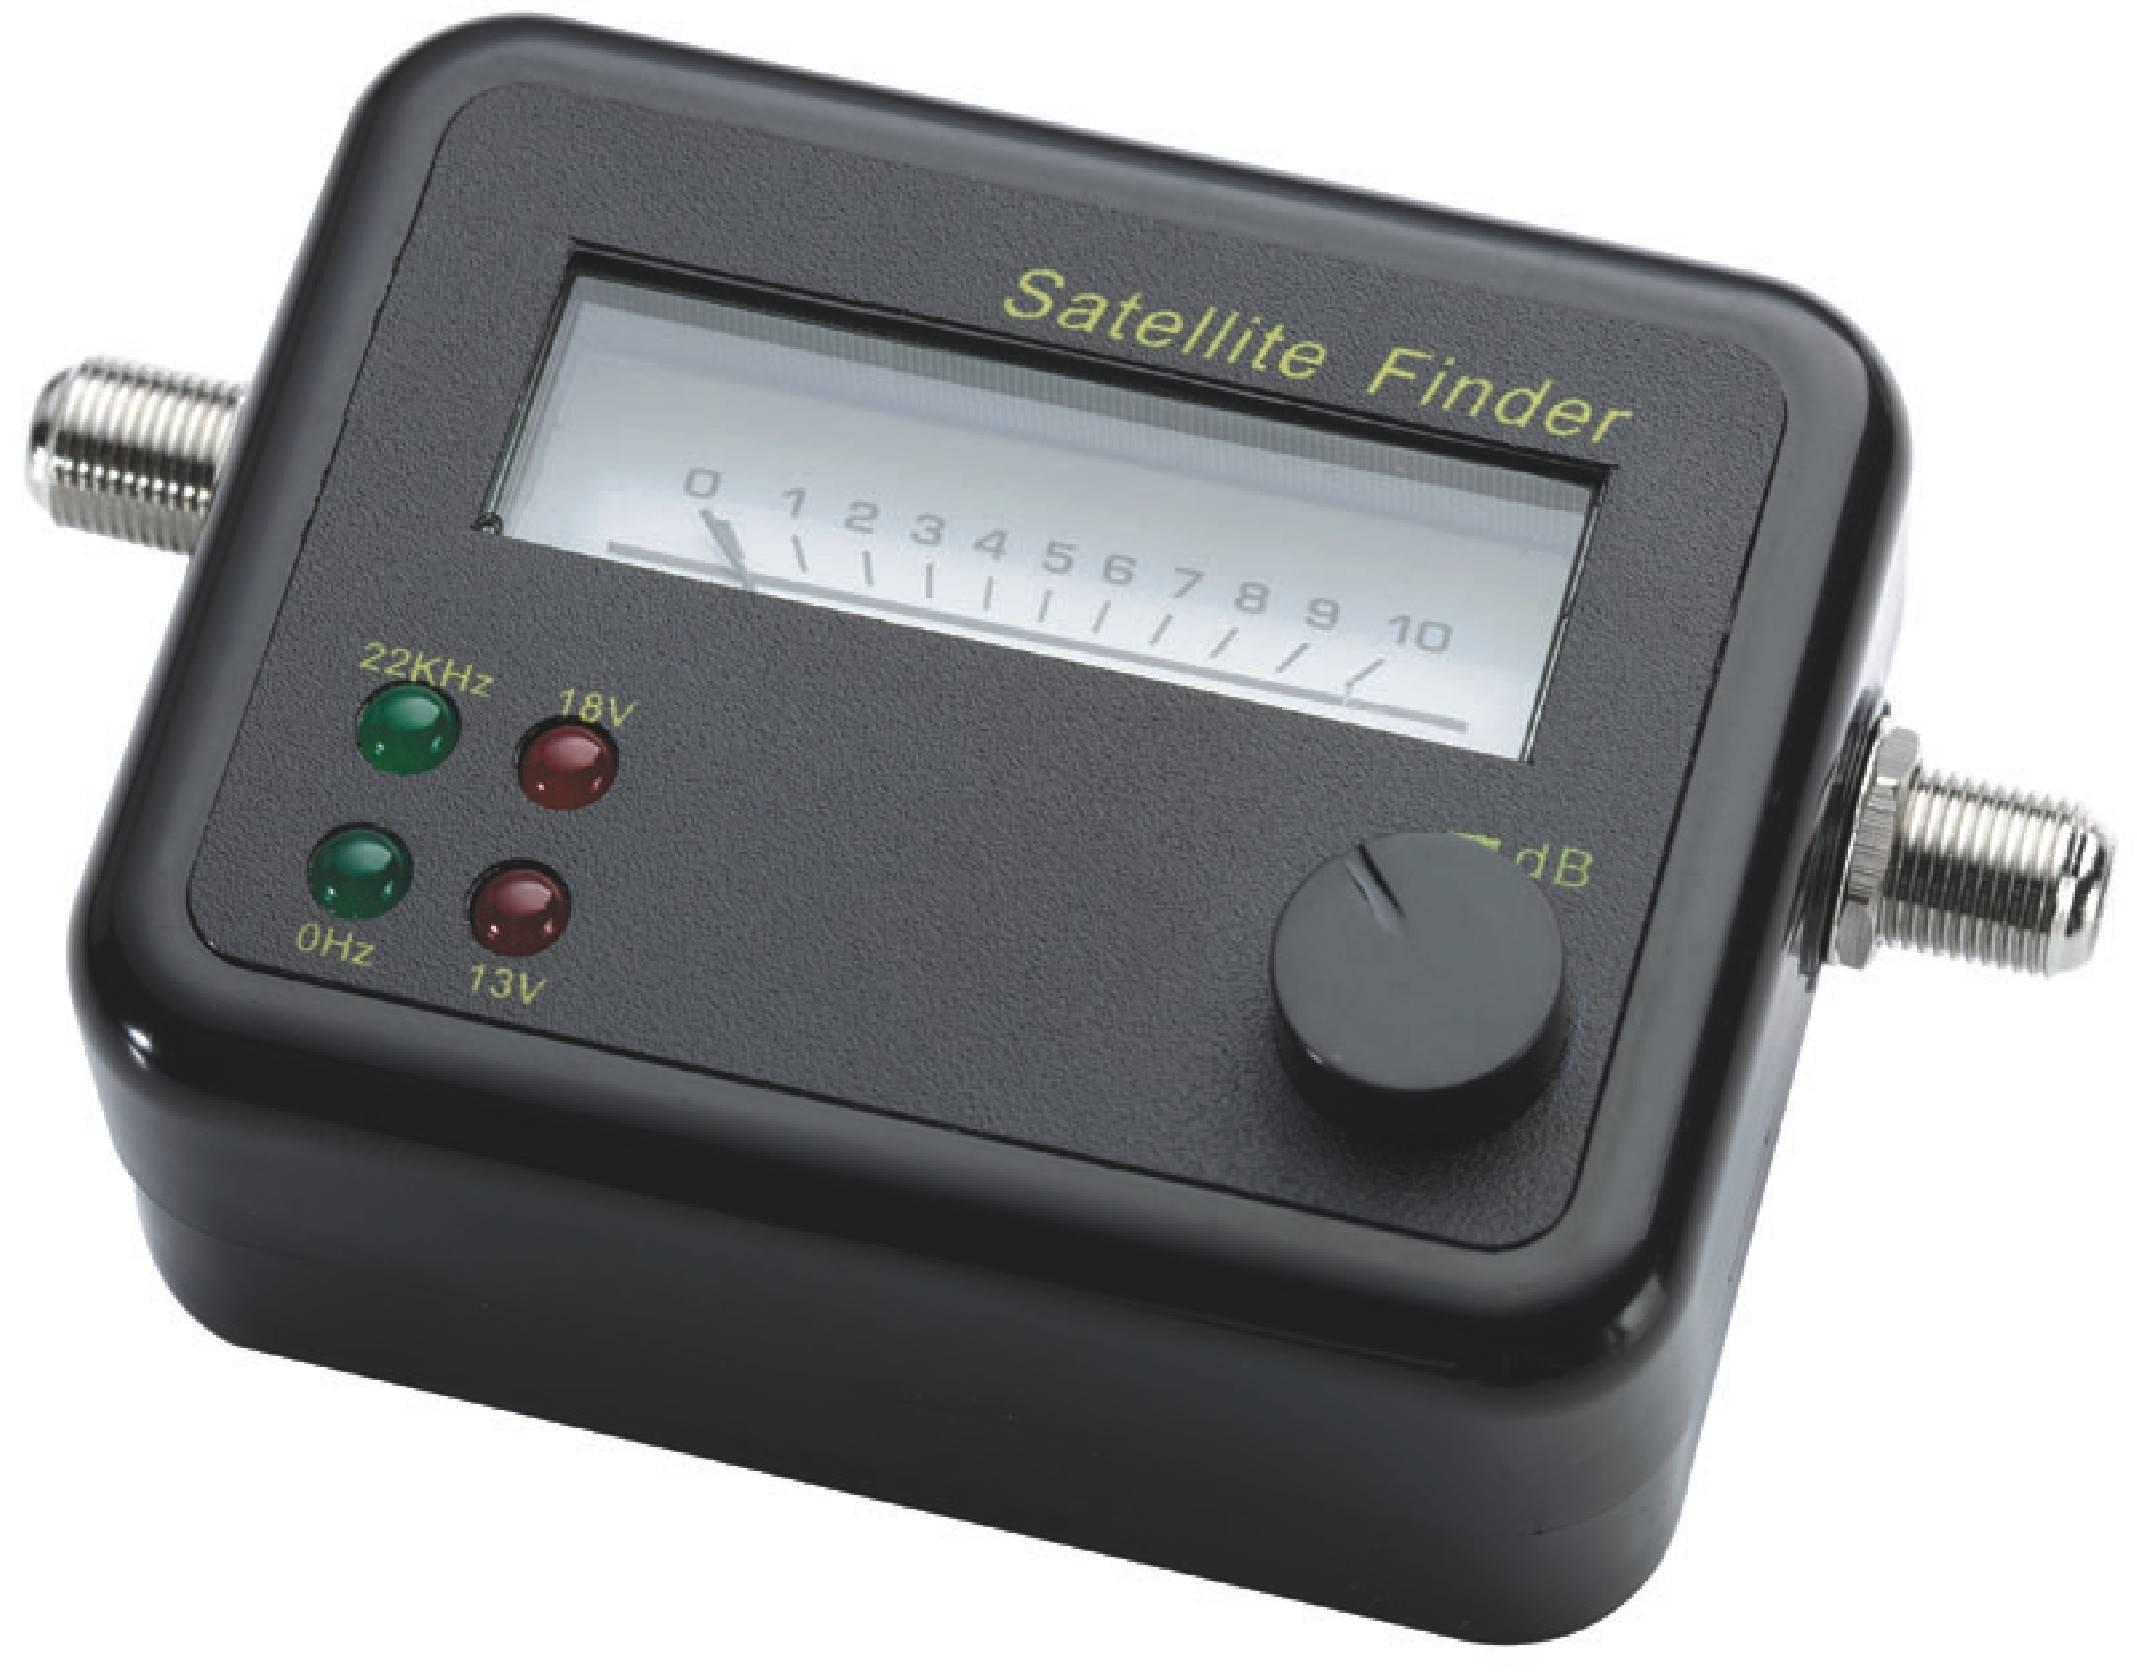 SF-9504